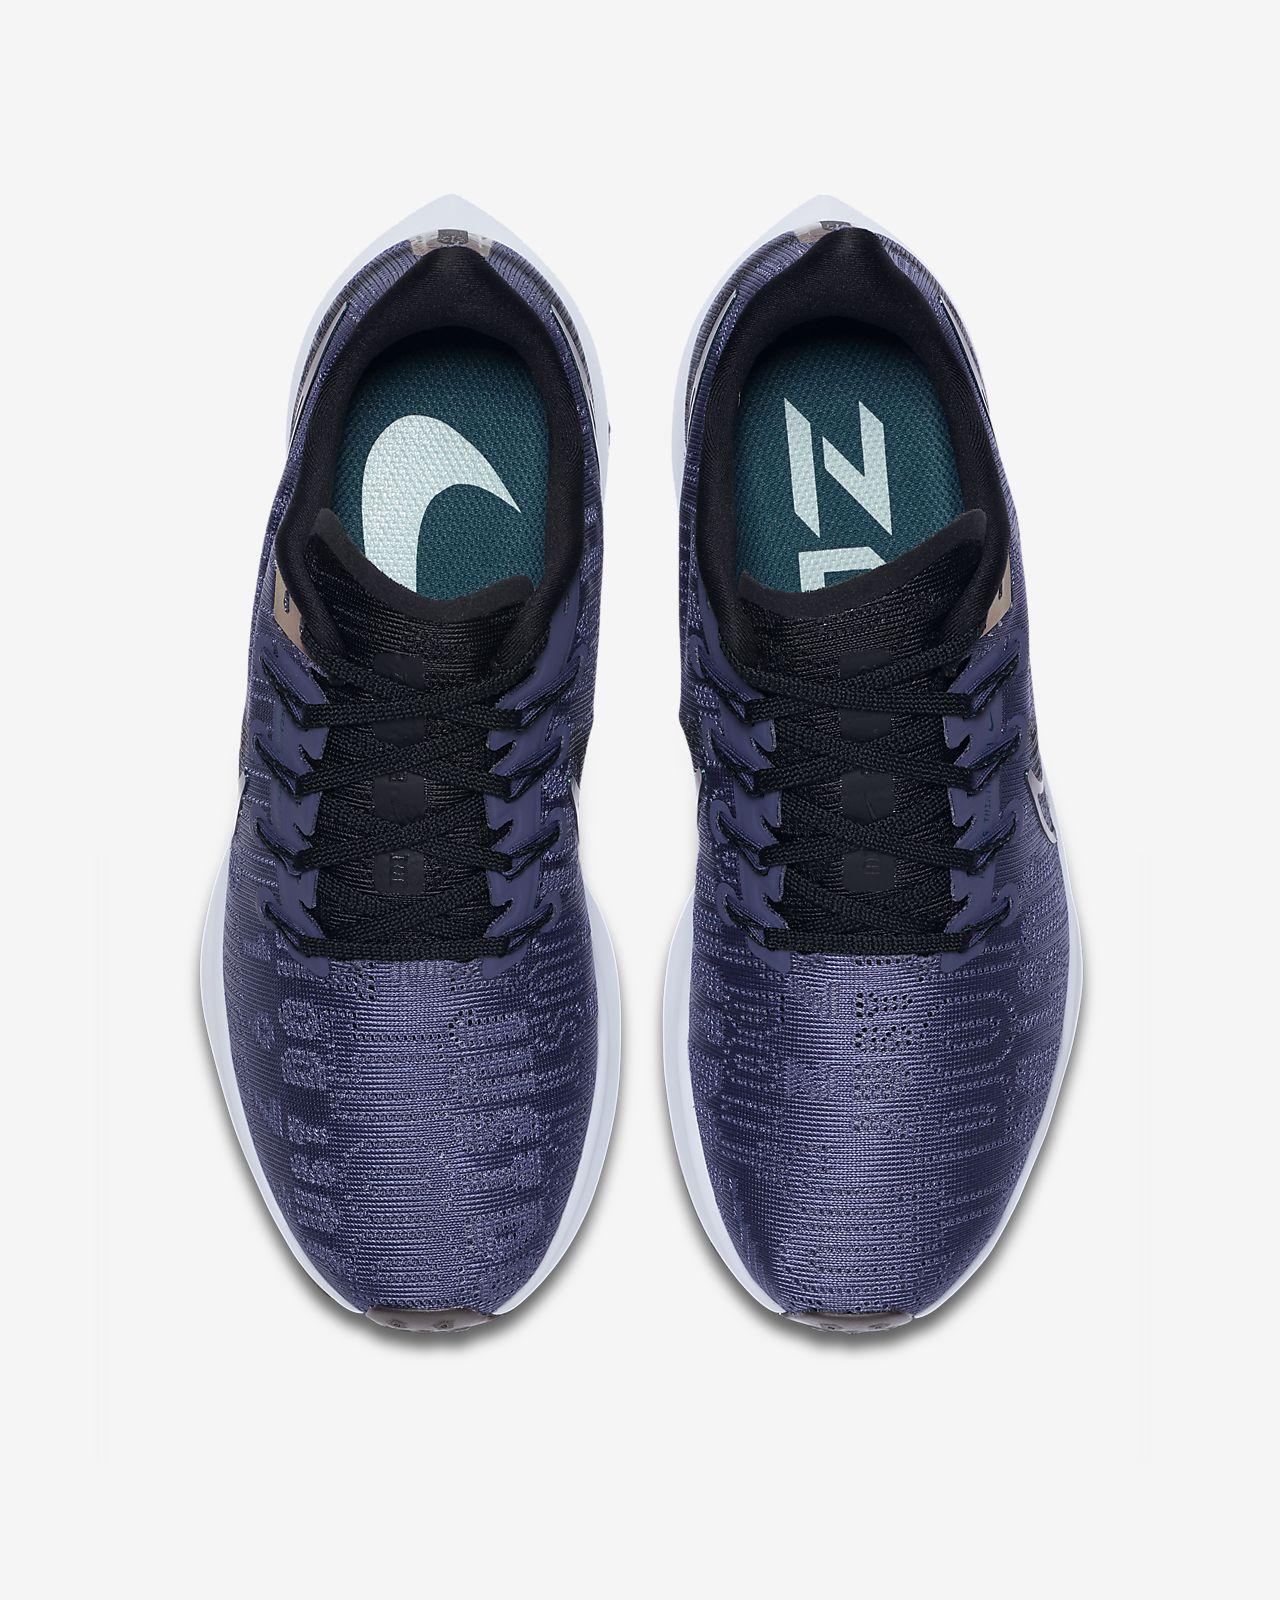 Nike Zoom Strike Ladies Running Shoes | Womens Running Shoes